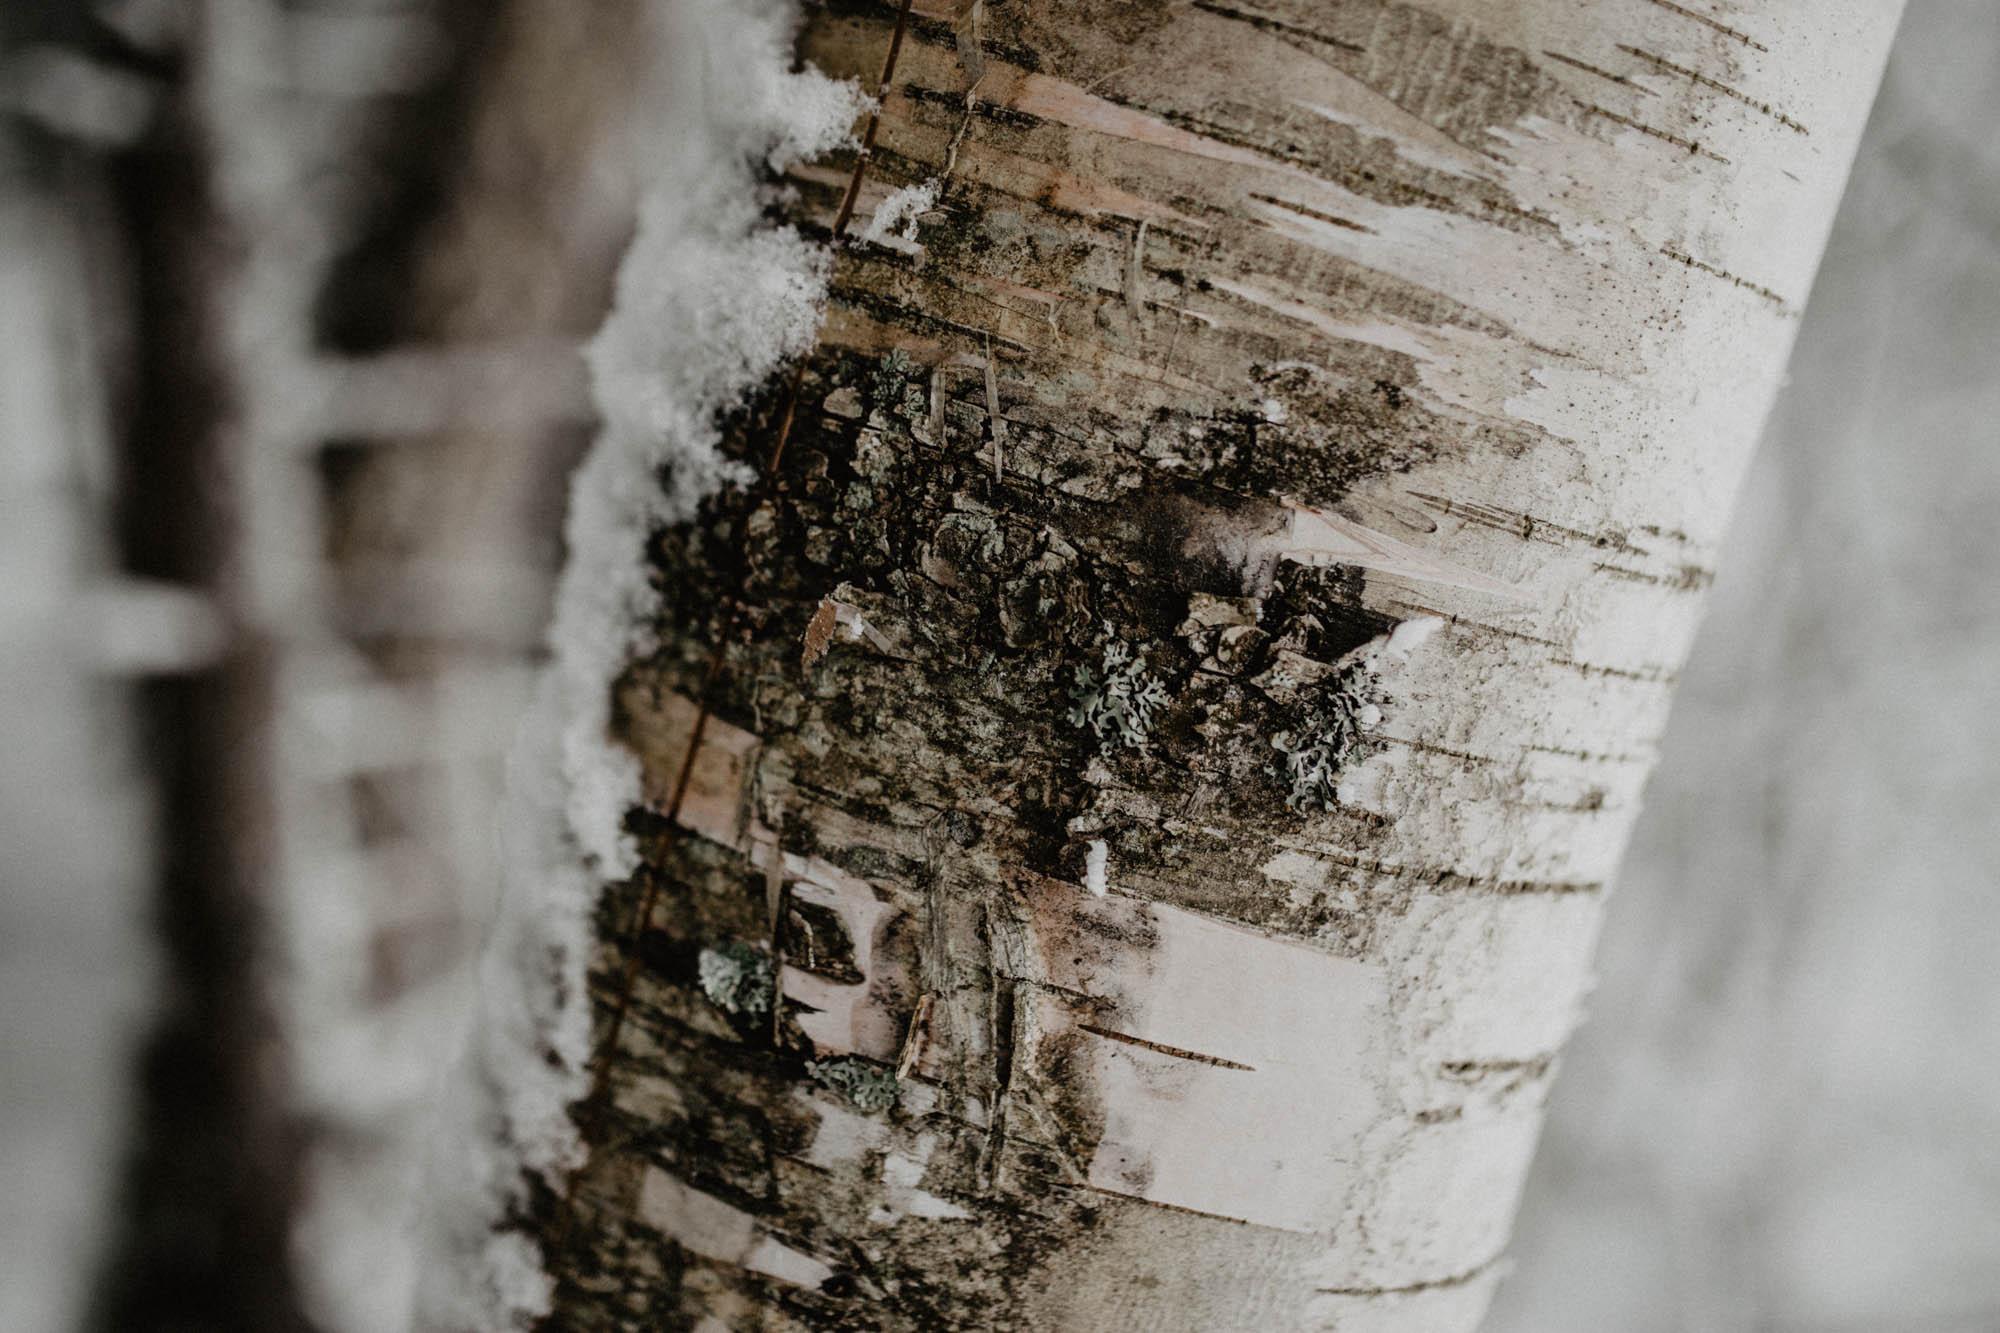 ashley_schulman_photography-winter_wedding_tampere-25.jpg